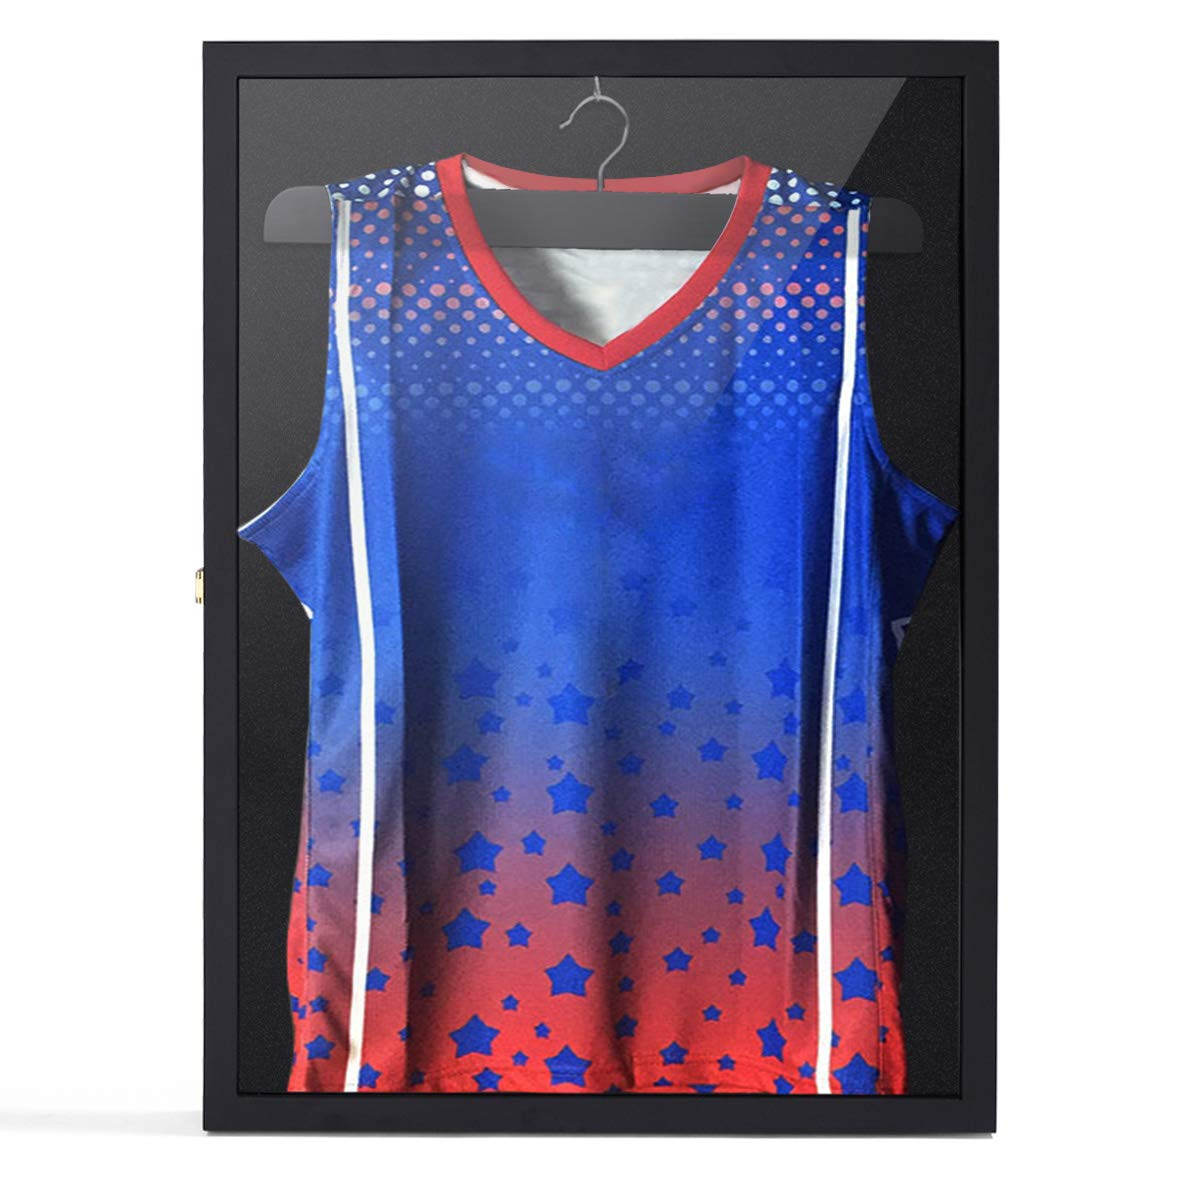 betterhomechoice Black Sports Jersey Frame Box Wall Display/Case Rack Frame Locable (Black) by betterhomechoice (Image #4)